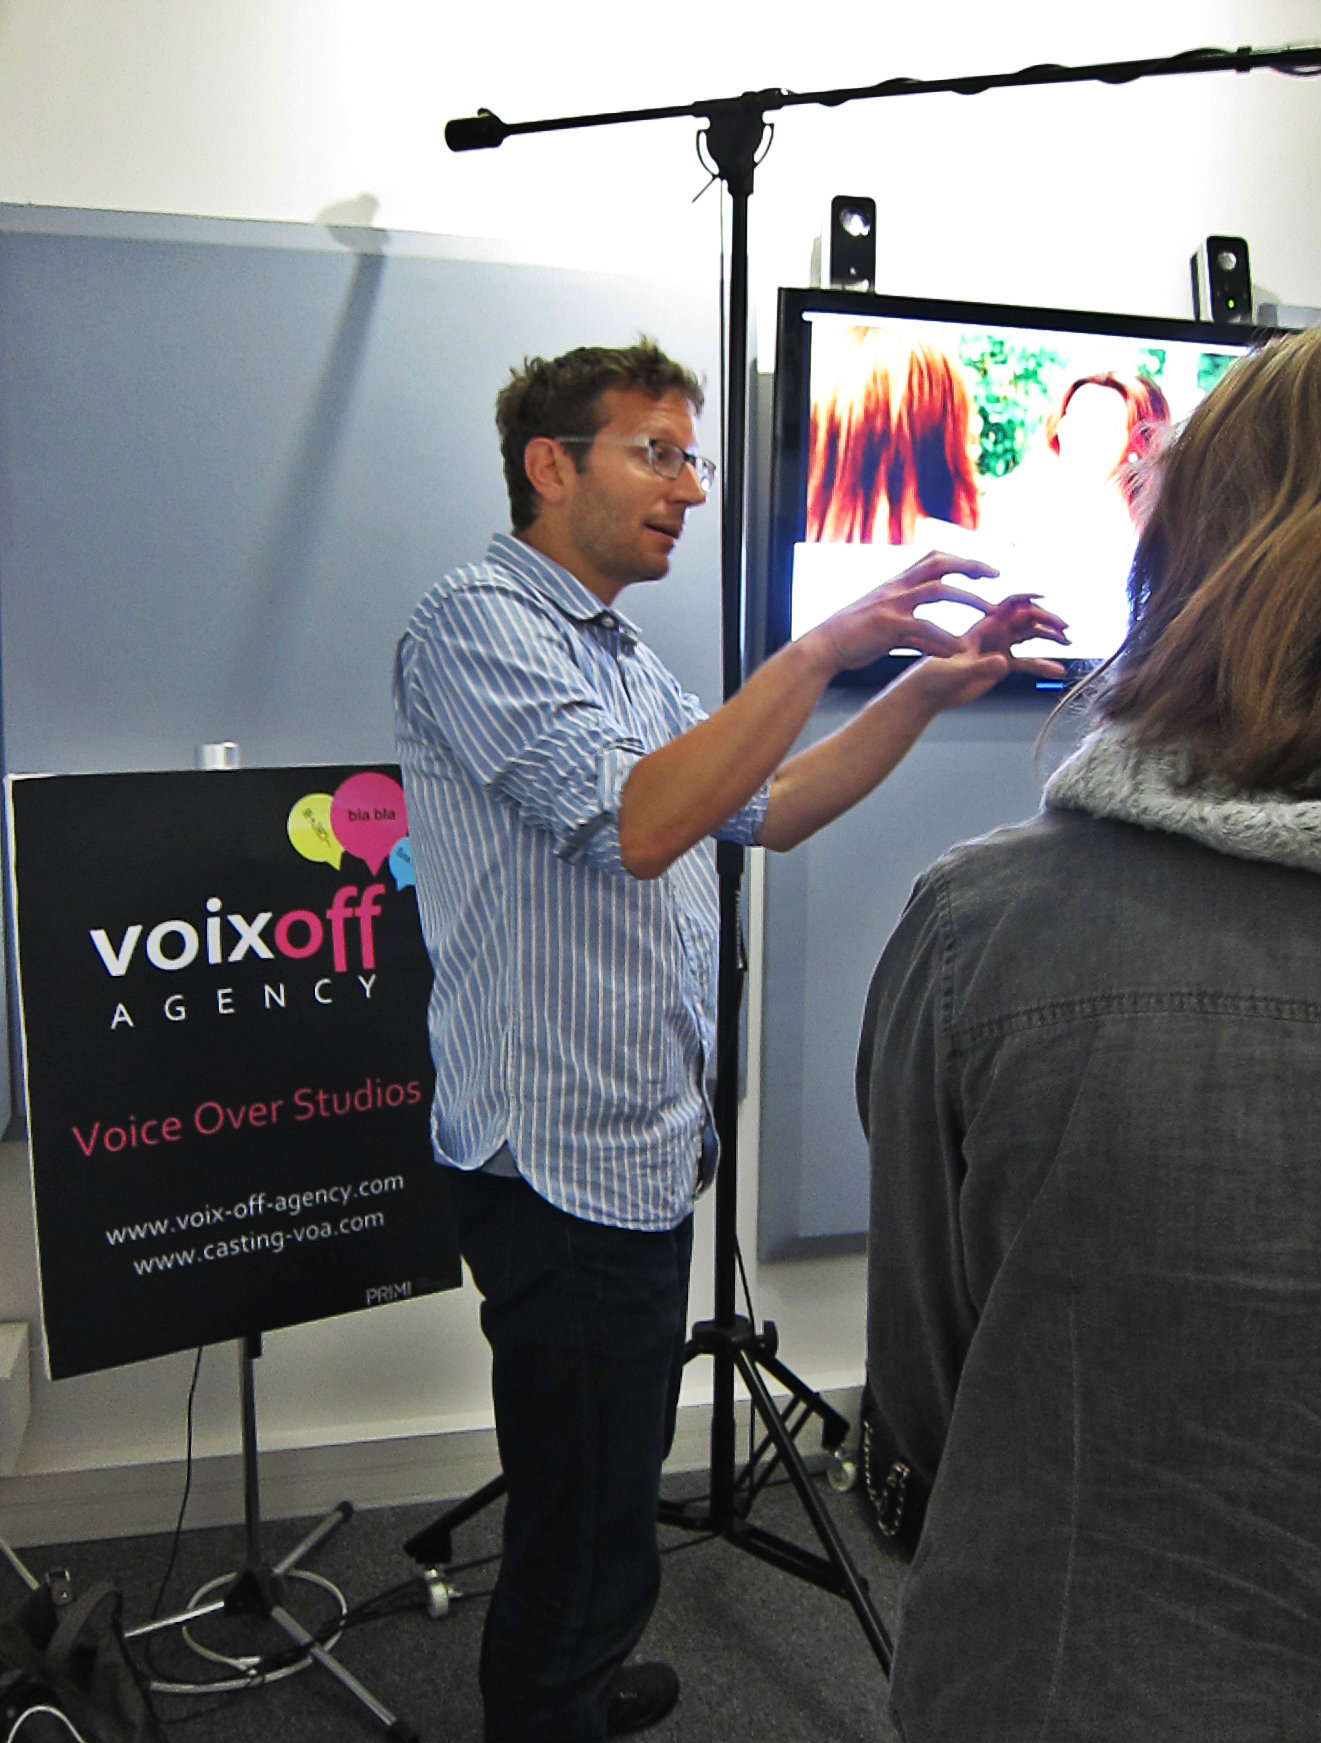 Visite Voix Off Agency VOA - CDT 93 Futur en Seine 2014